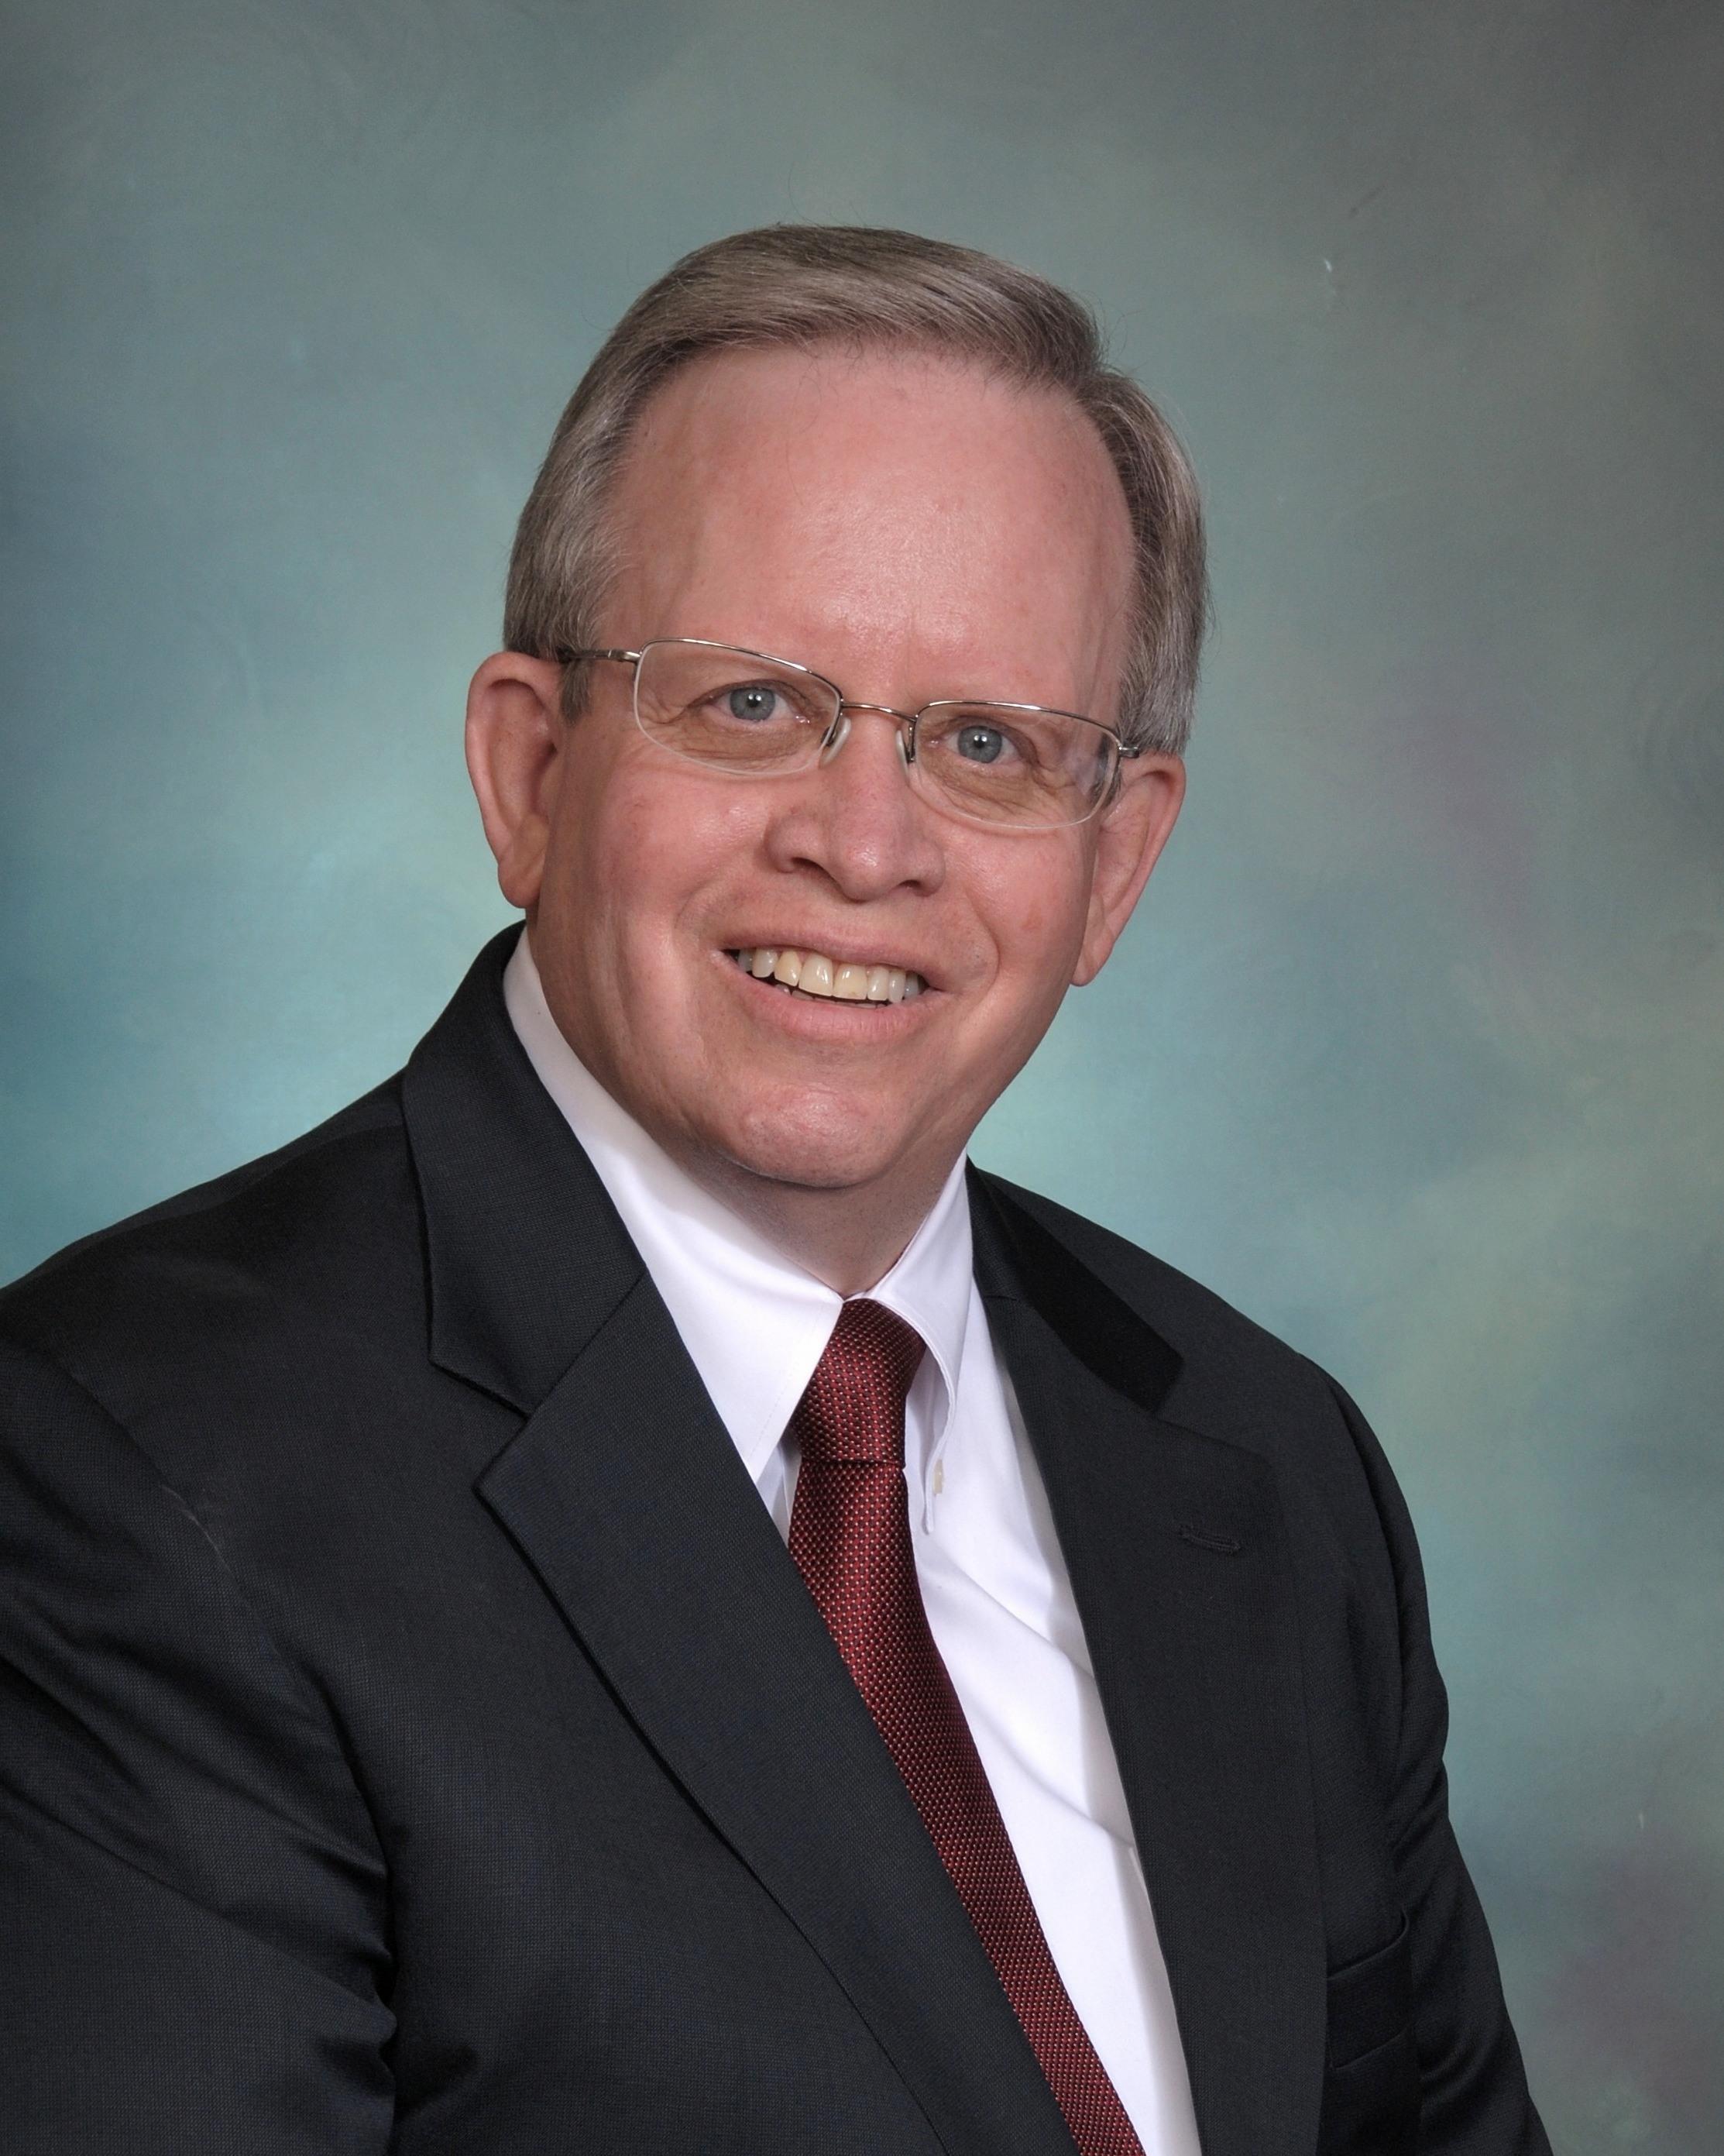 DANIEL K. WATSON  Your Registered Representative & Insurance Agent